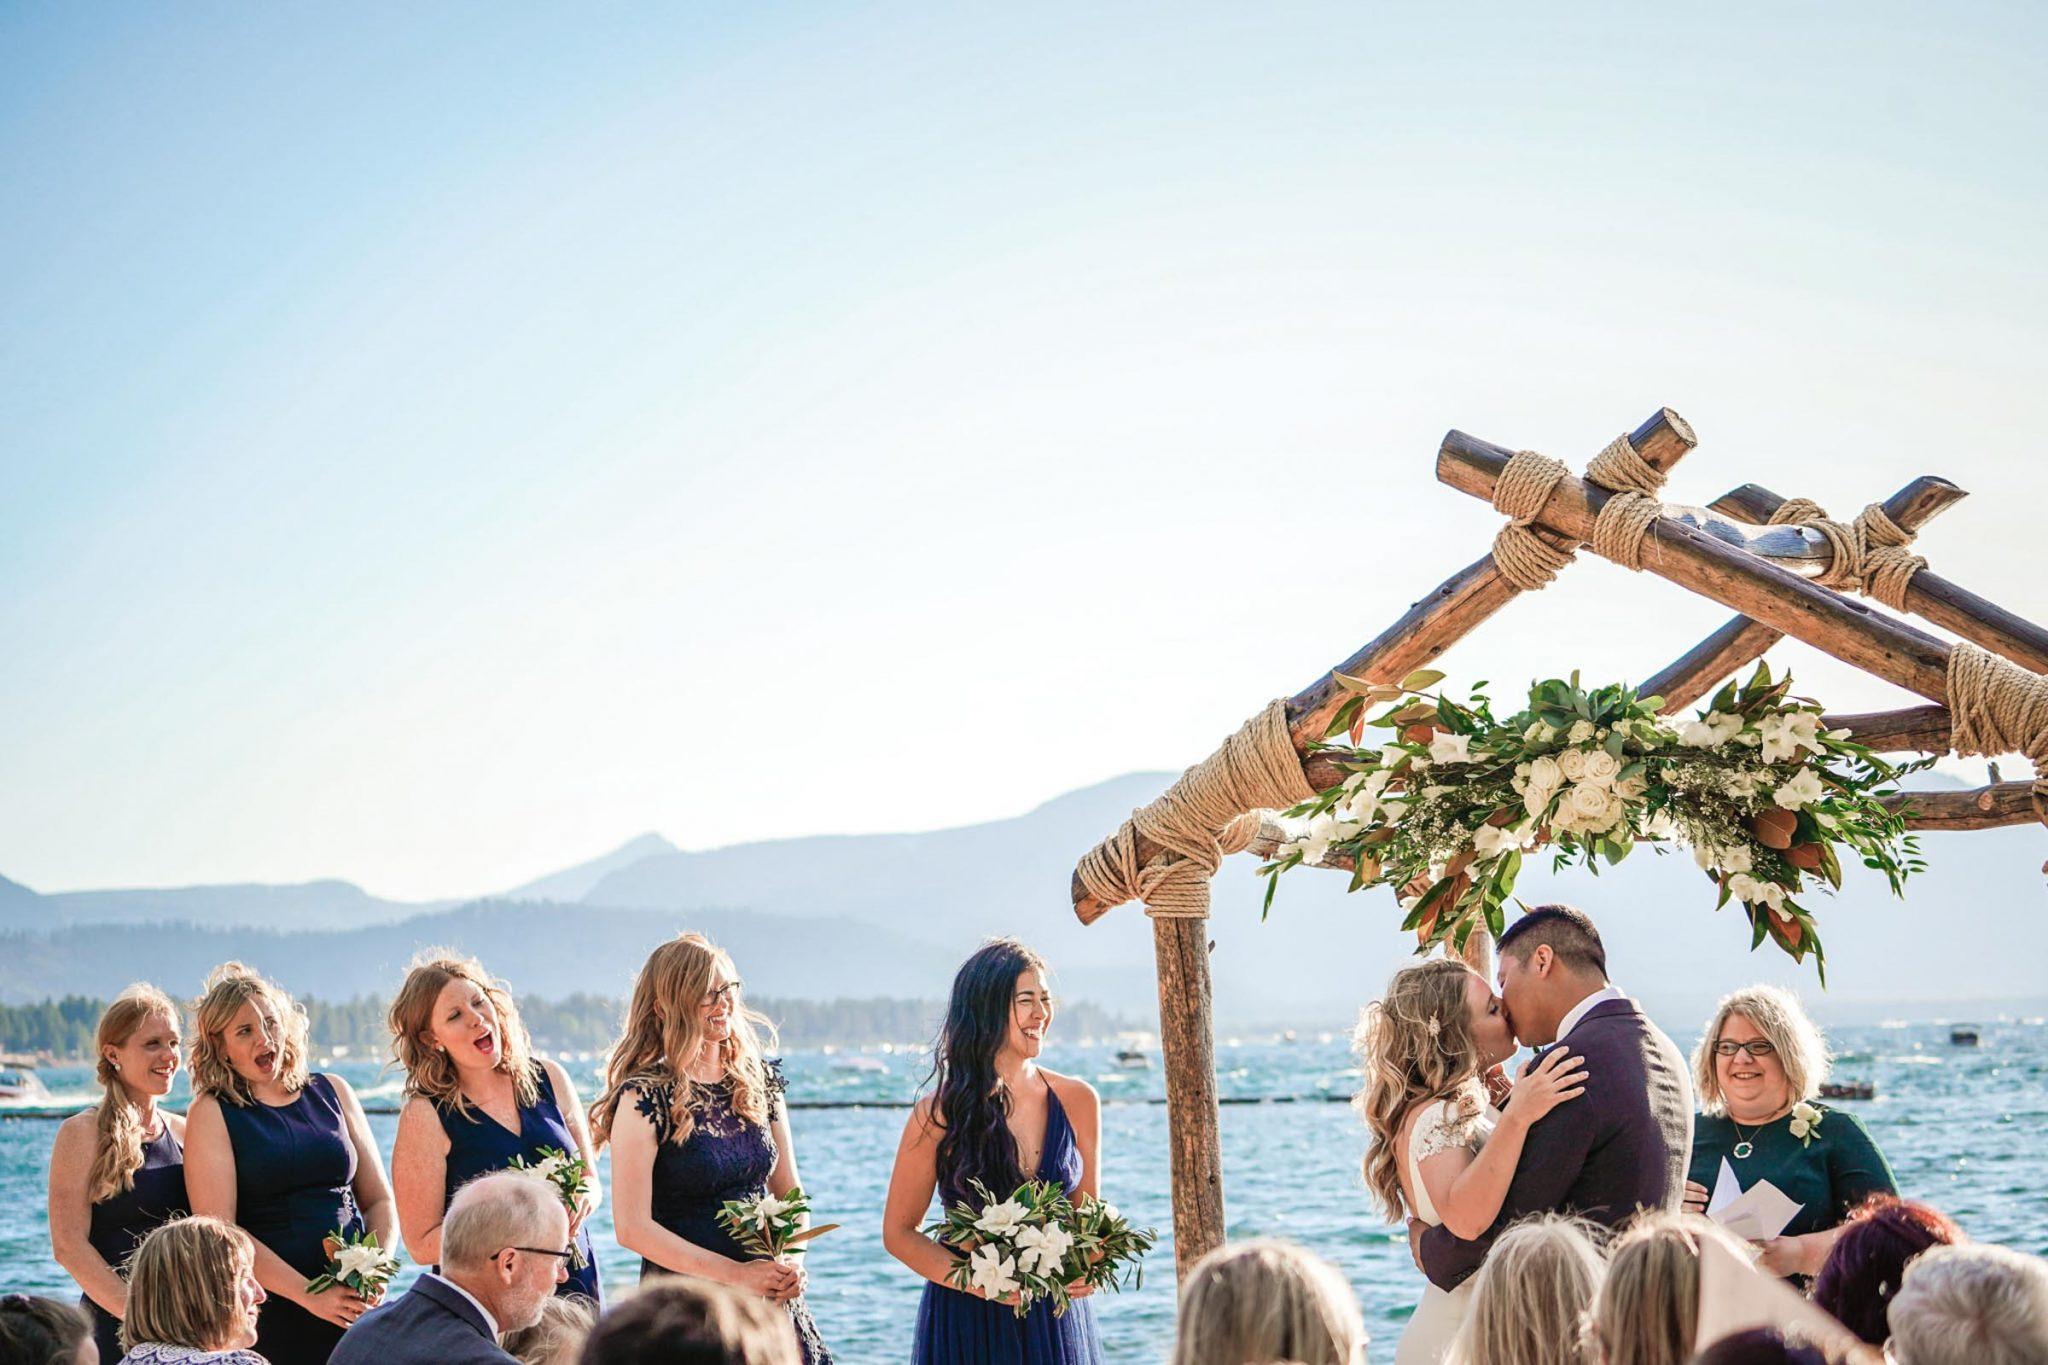 Lake Tahoe wedding photography at Lakeside Beach